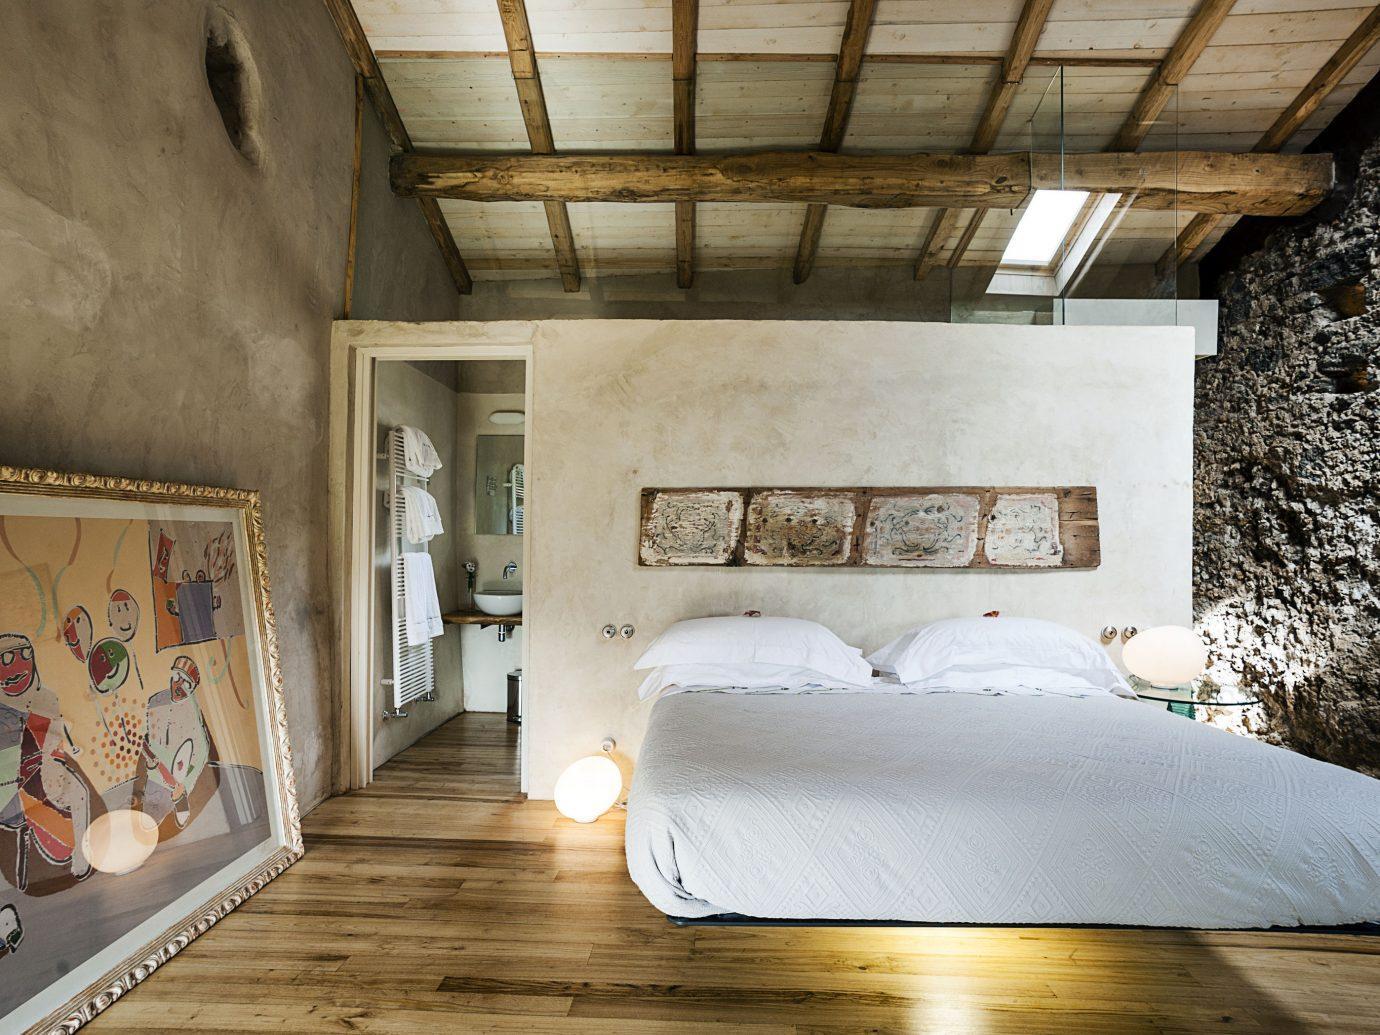 Trip Ideas indoor floor room Architecture interior design ceiling wall home bed wood house loft Bedroom daylighting furniture bed frame window flooring interior designer